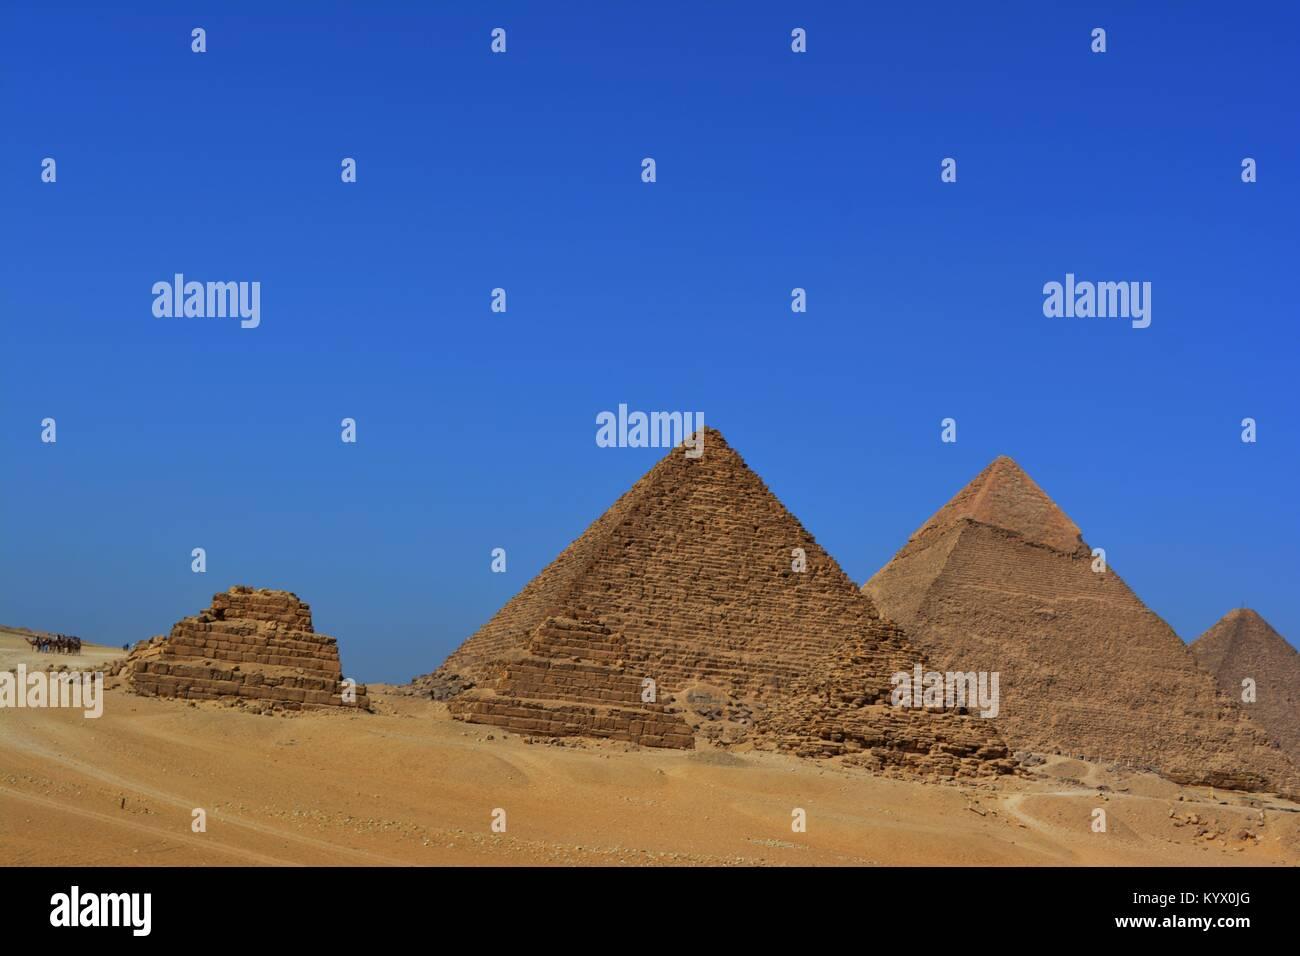 giza piramids, 5 piramids - Stock Image